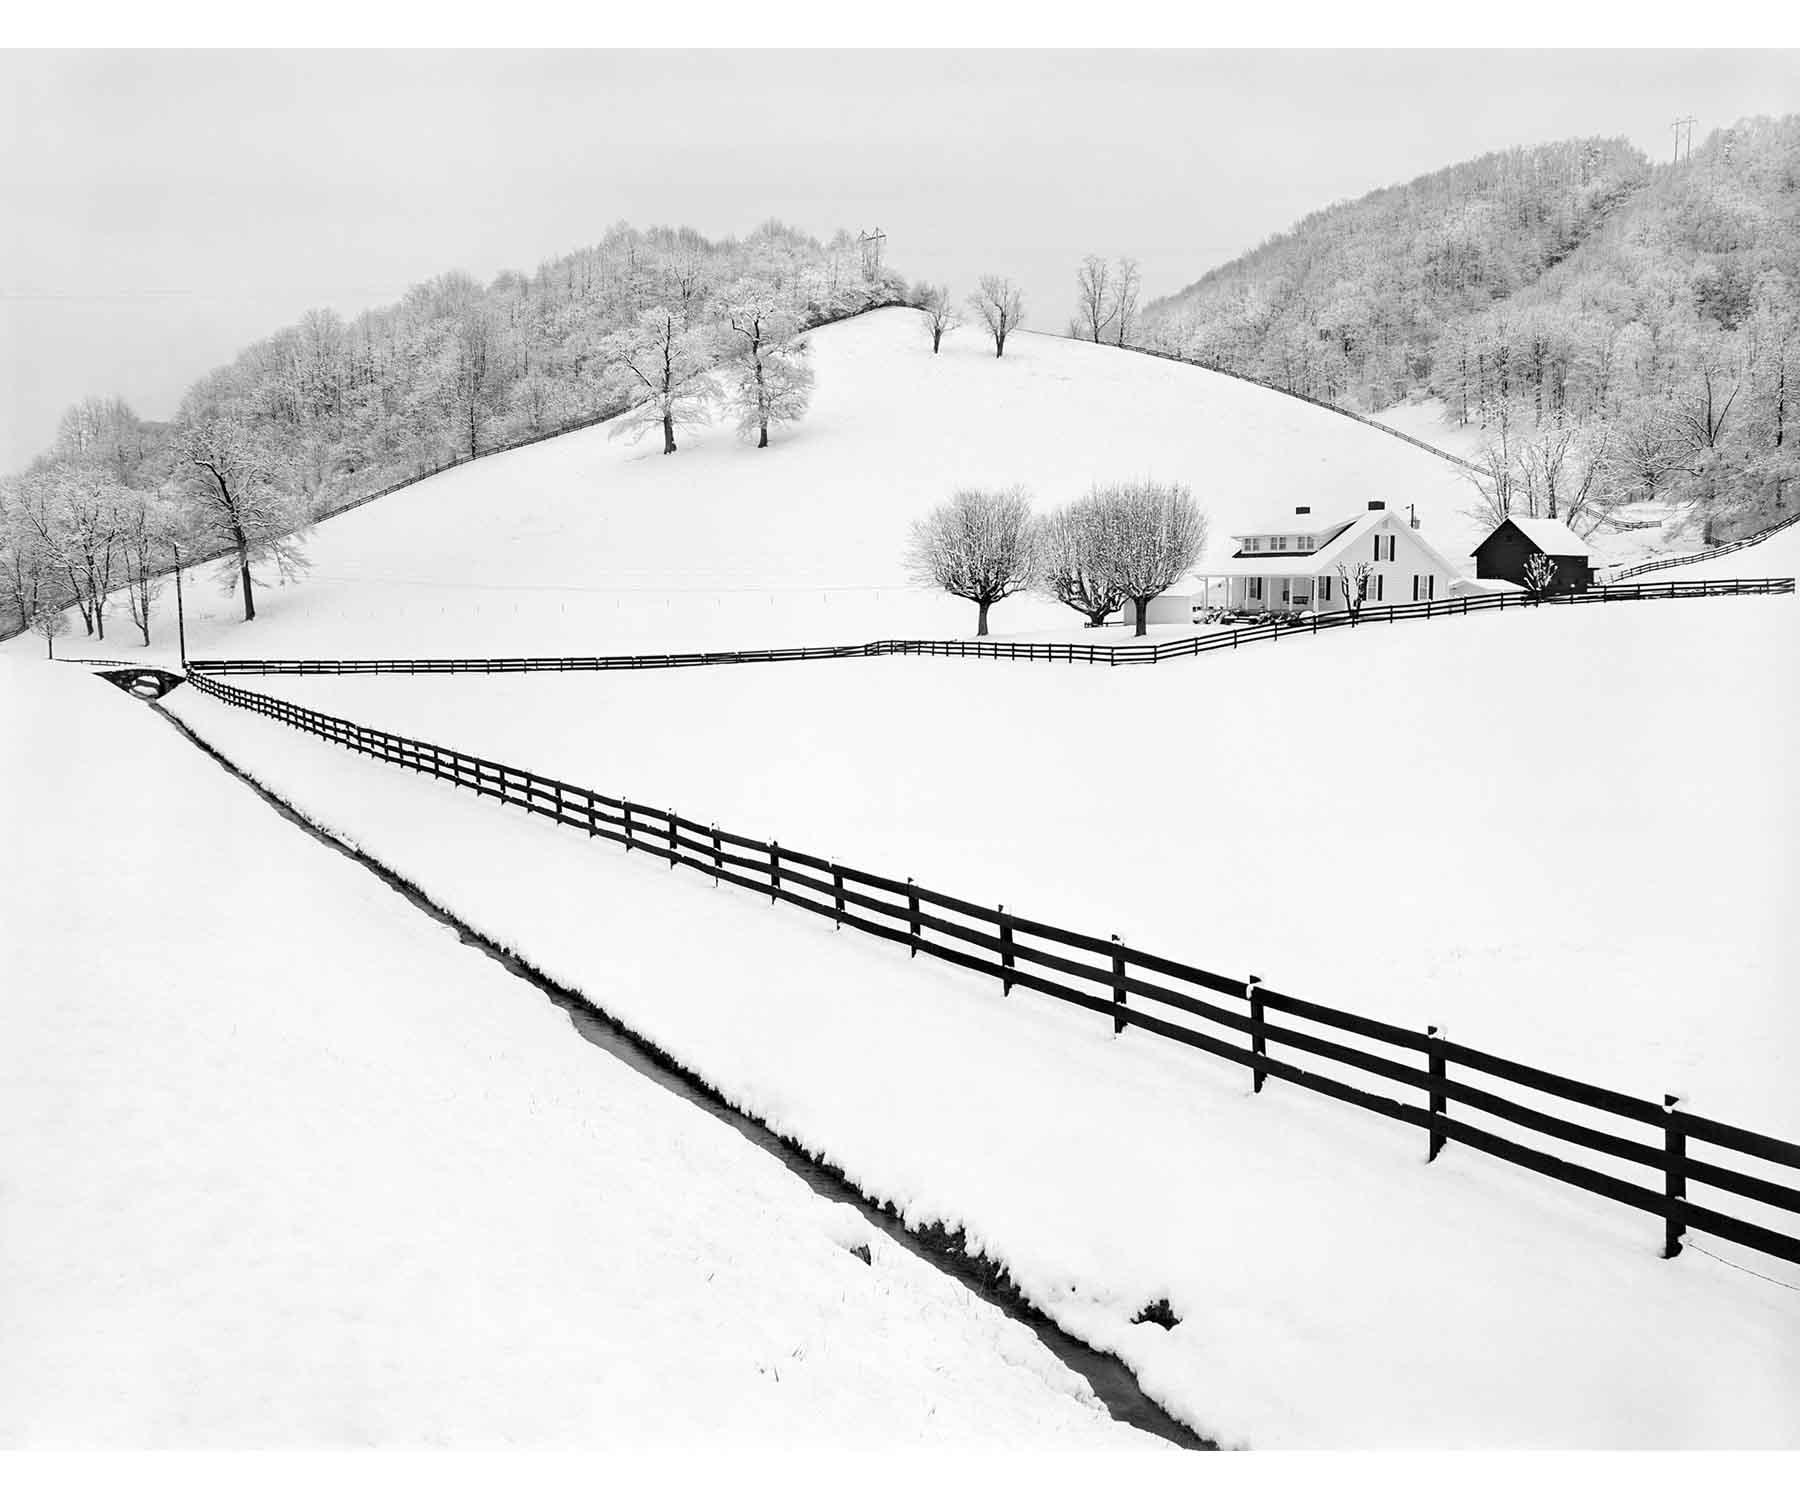 Snow fences Appalachia landscape Appalachian Tim Barnwell Photographer